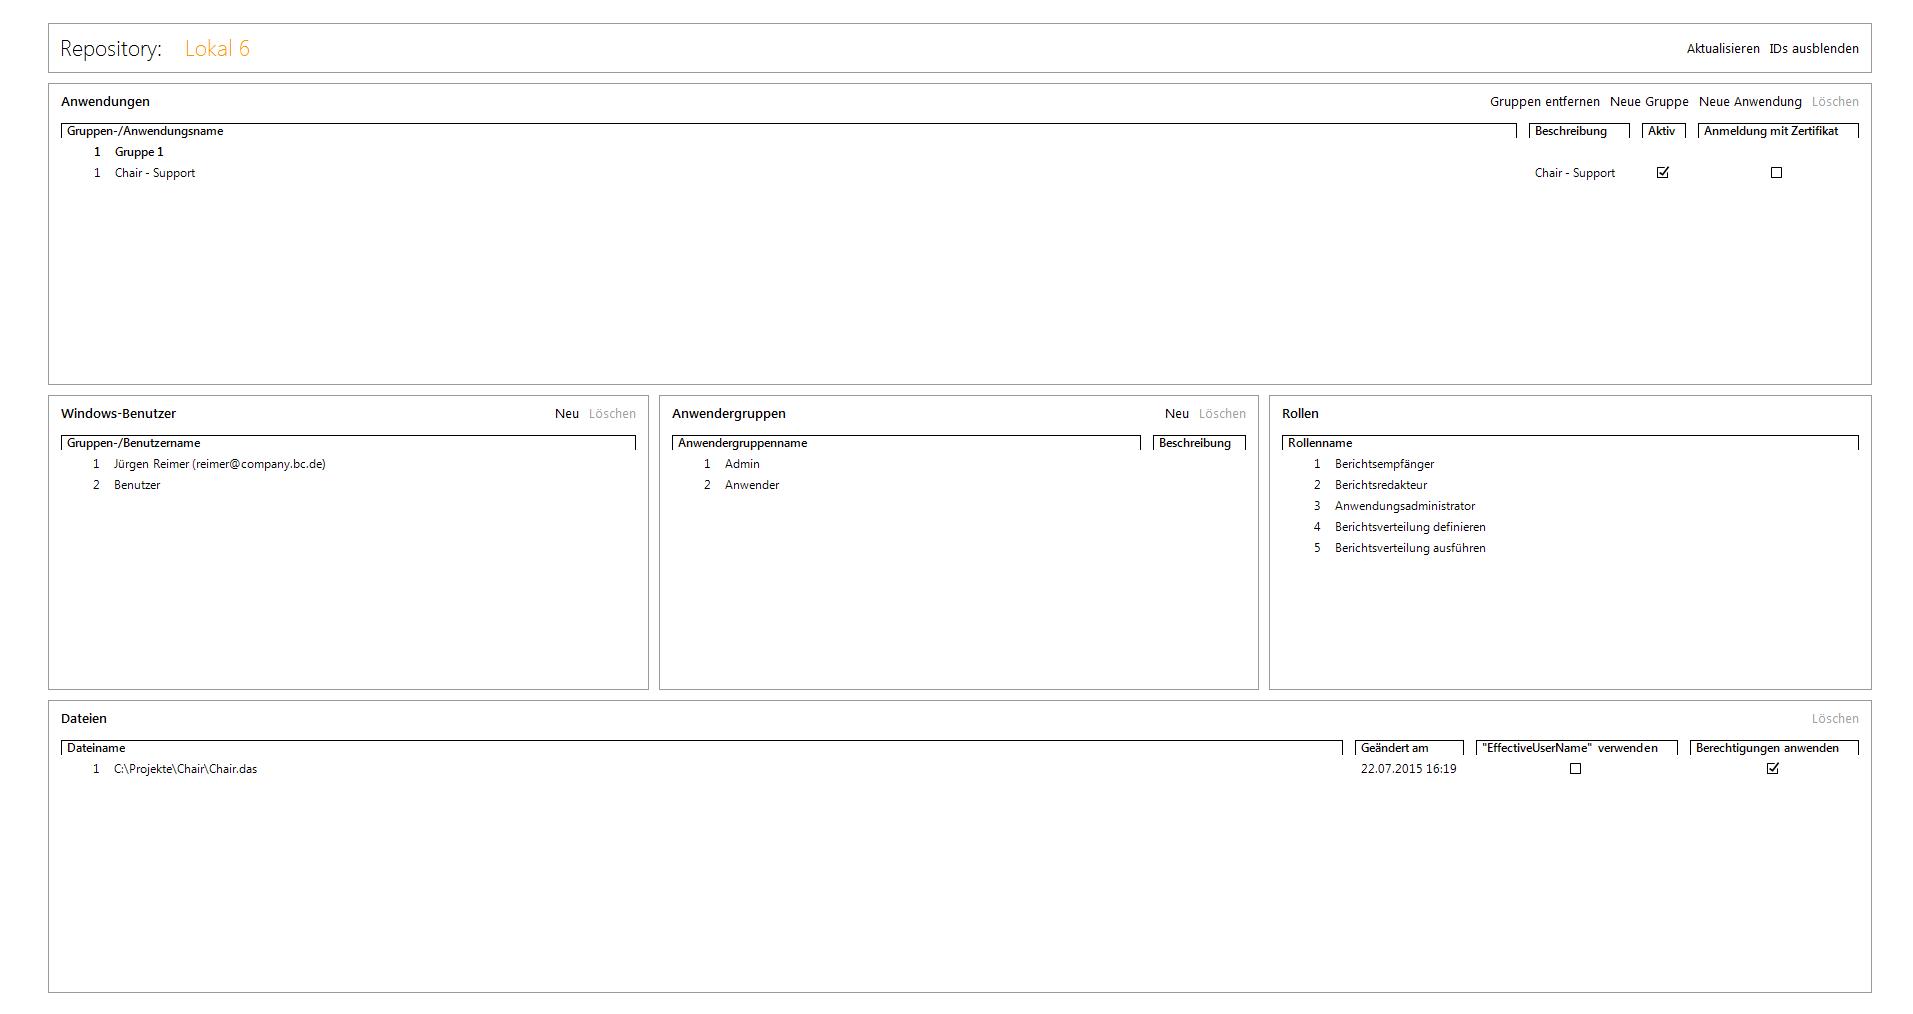 Abbildung 1 Oberfläche Repository Rollenverwaltung